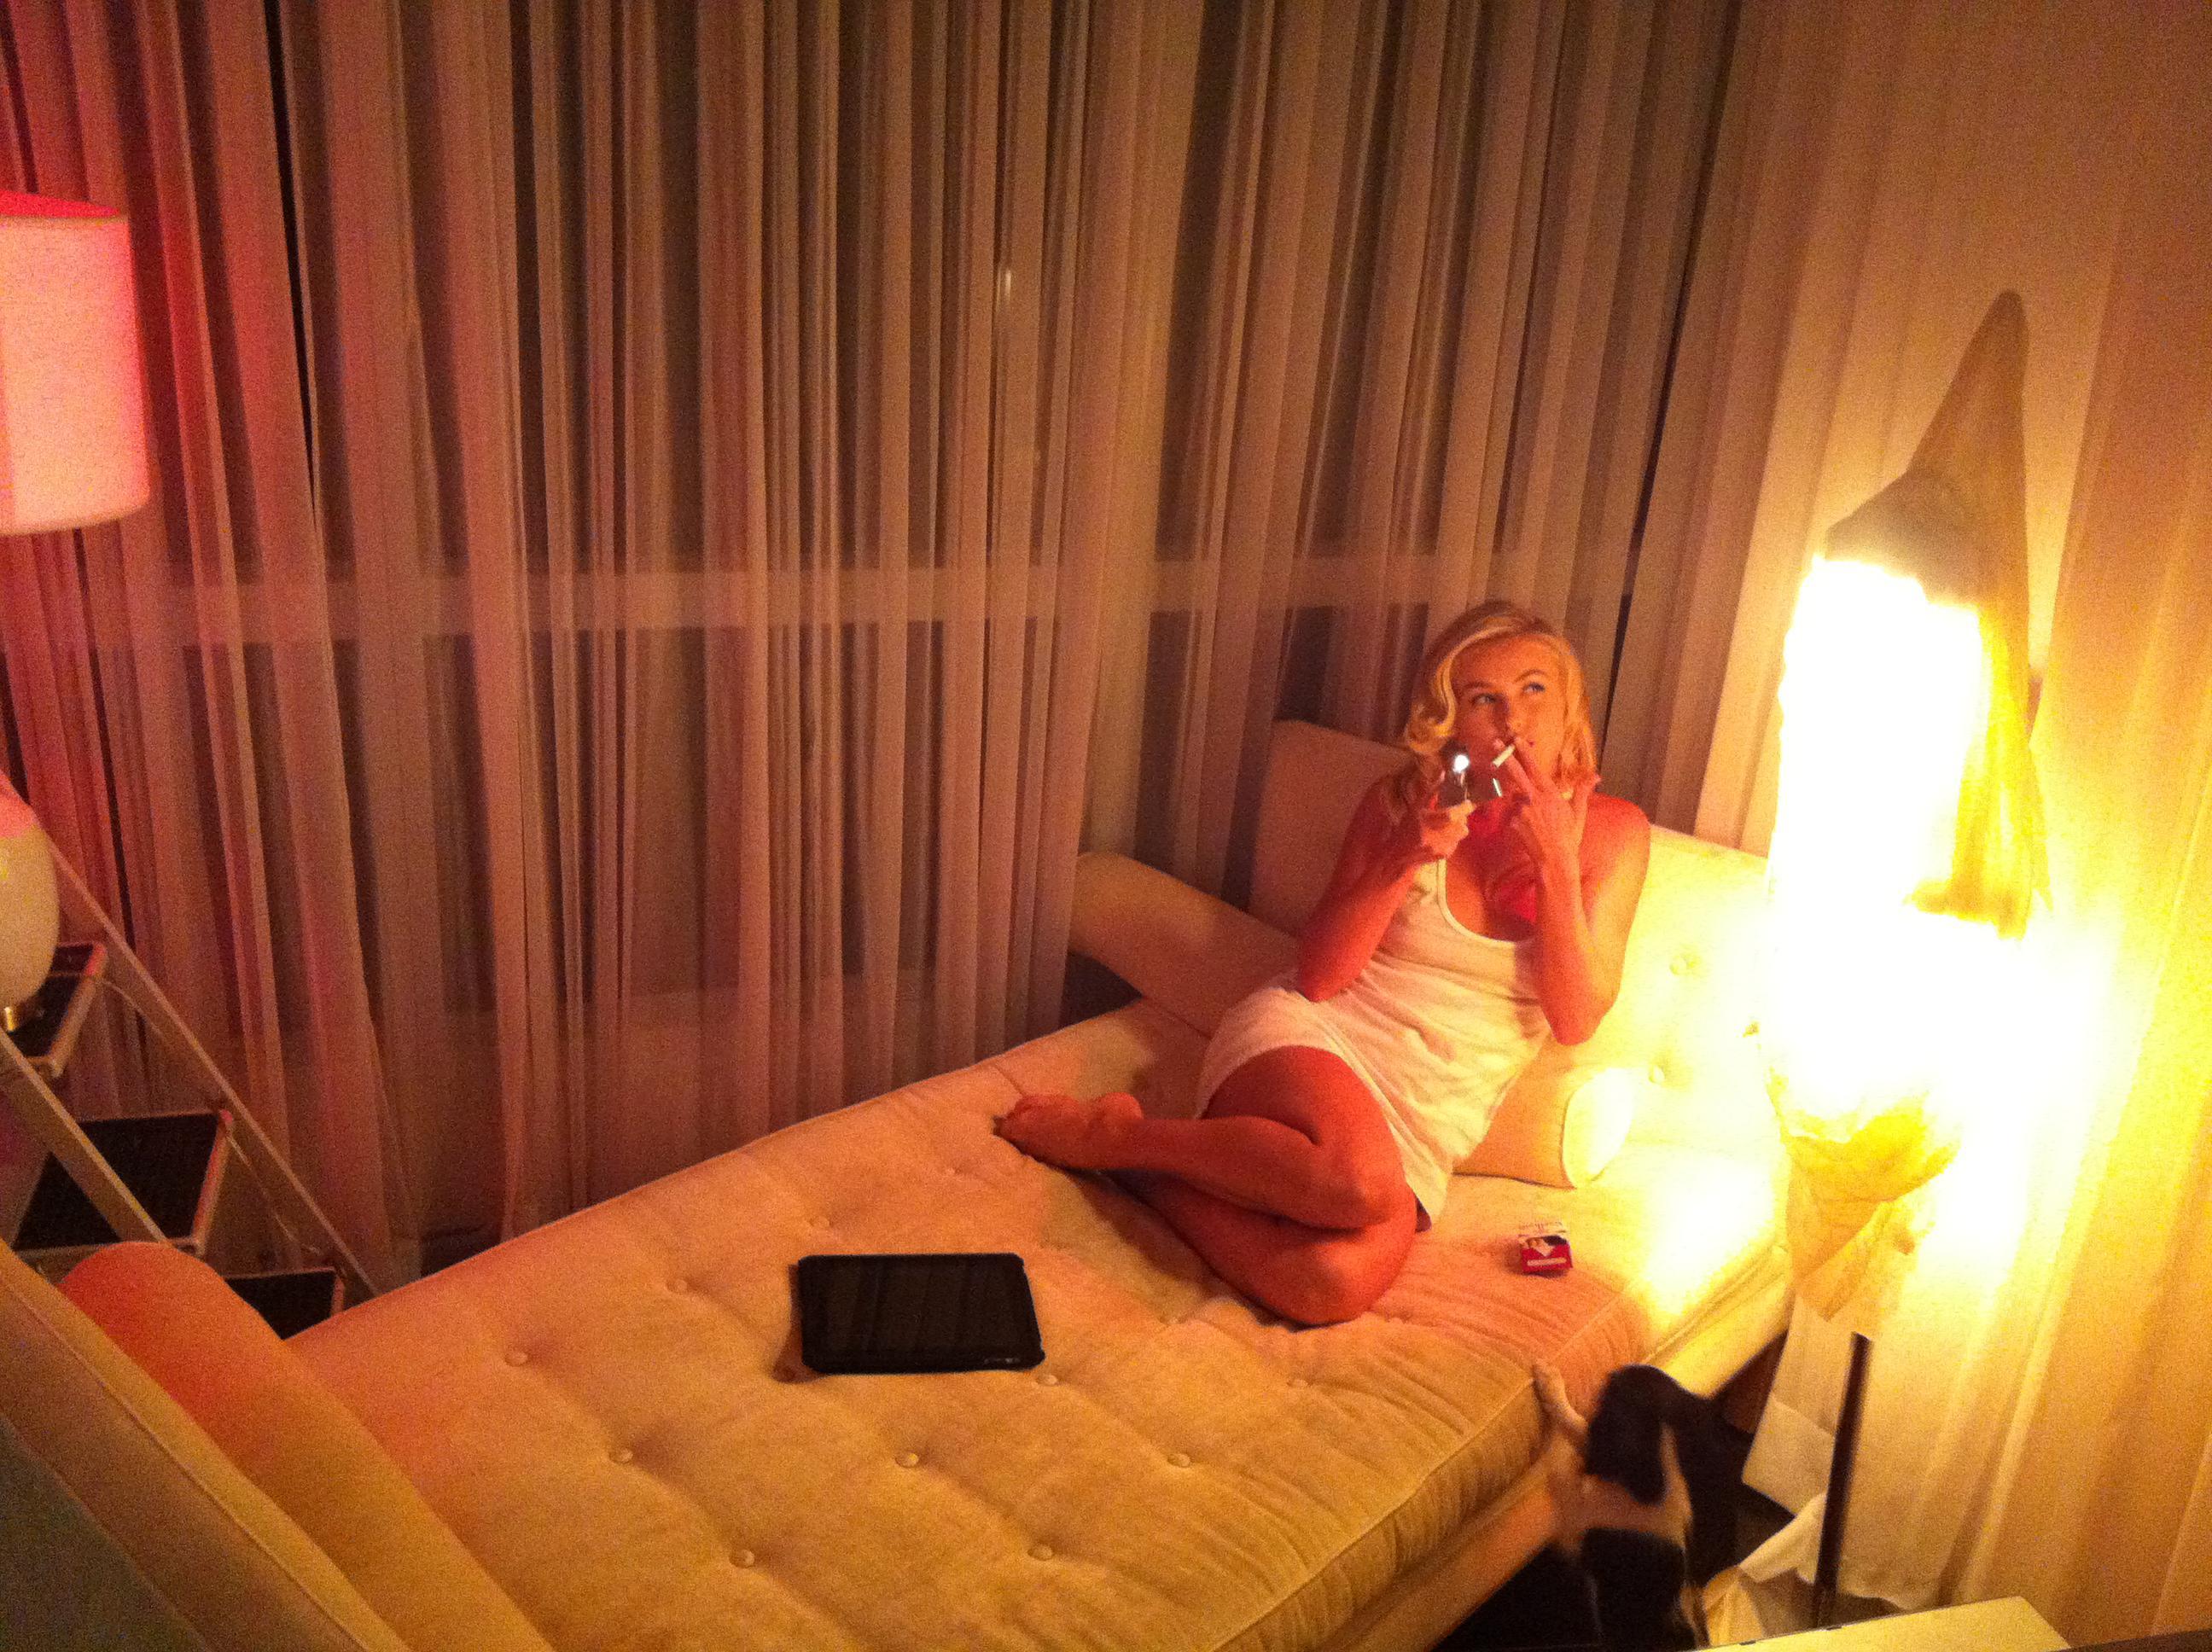 fotos de Julianne Hough desnuda